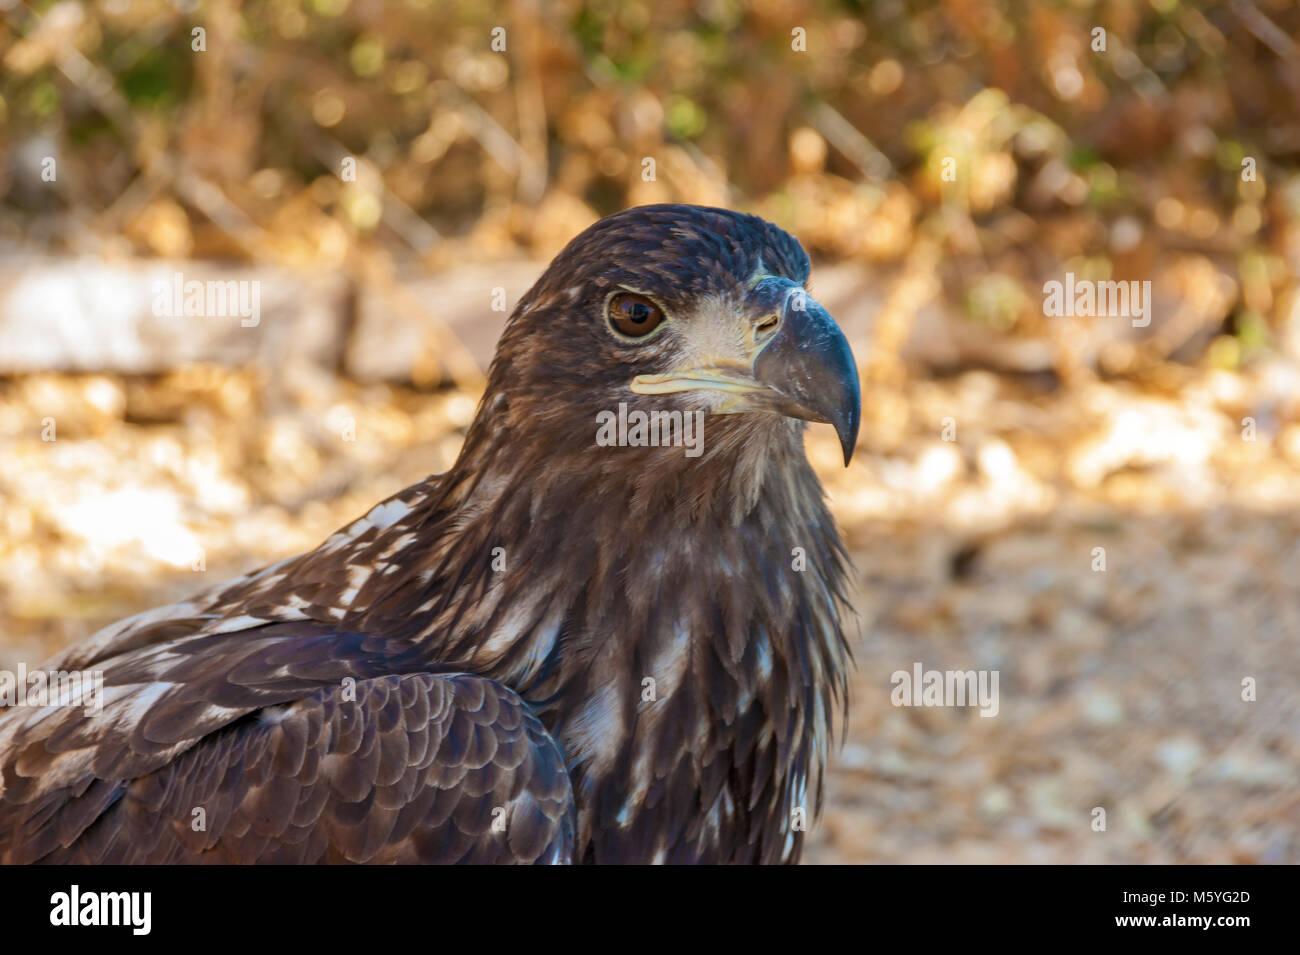 Head of a falcon bird with a huge beak close-up. Hawk close up. - Stock Image